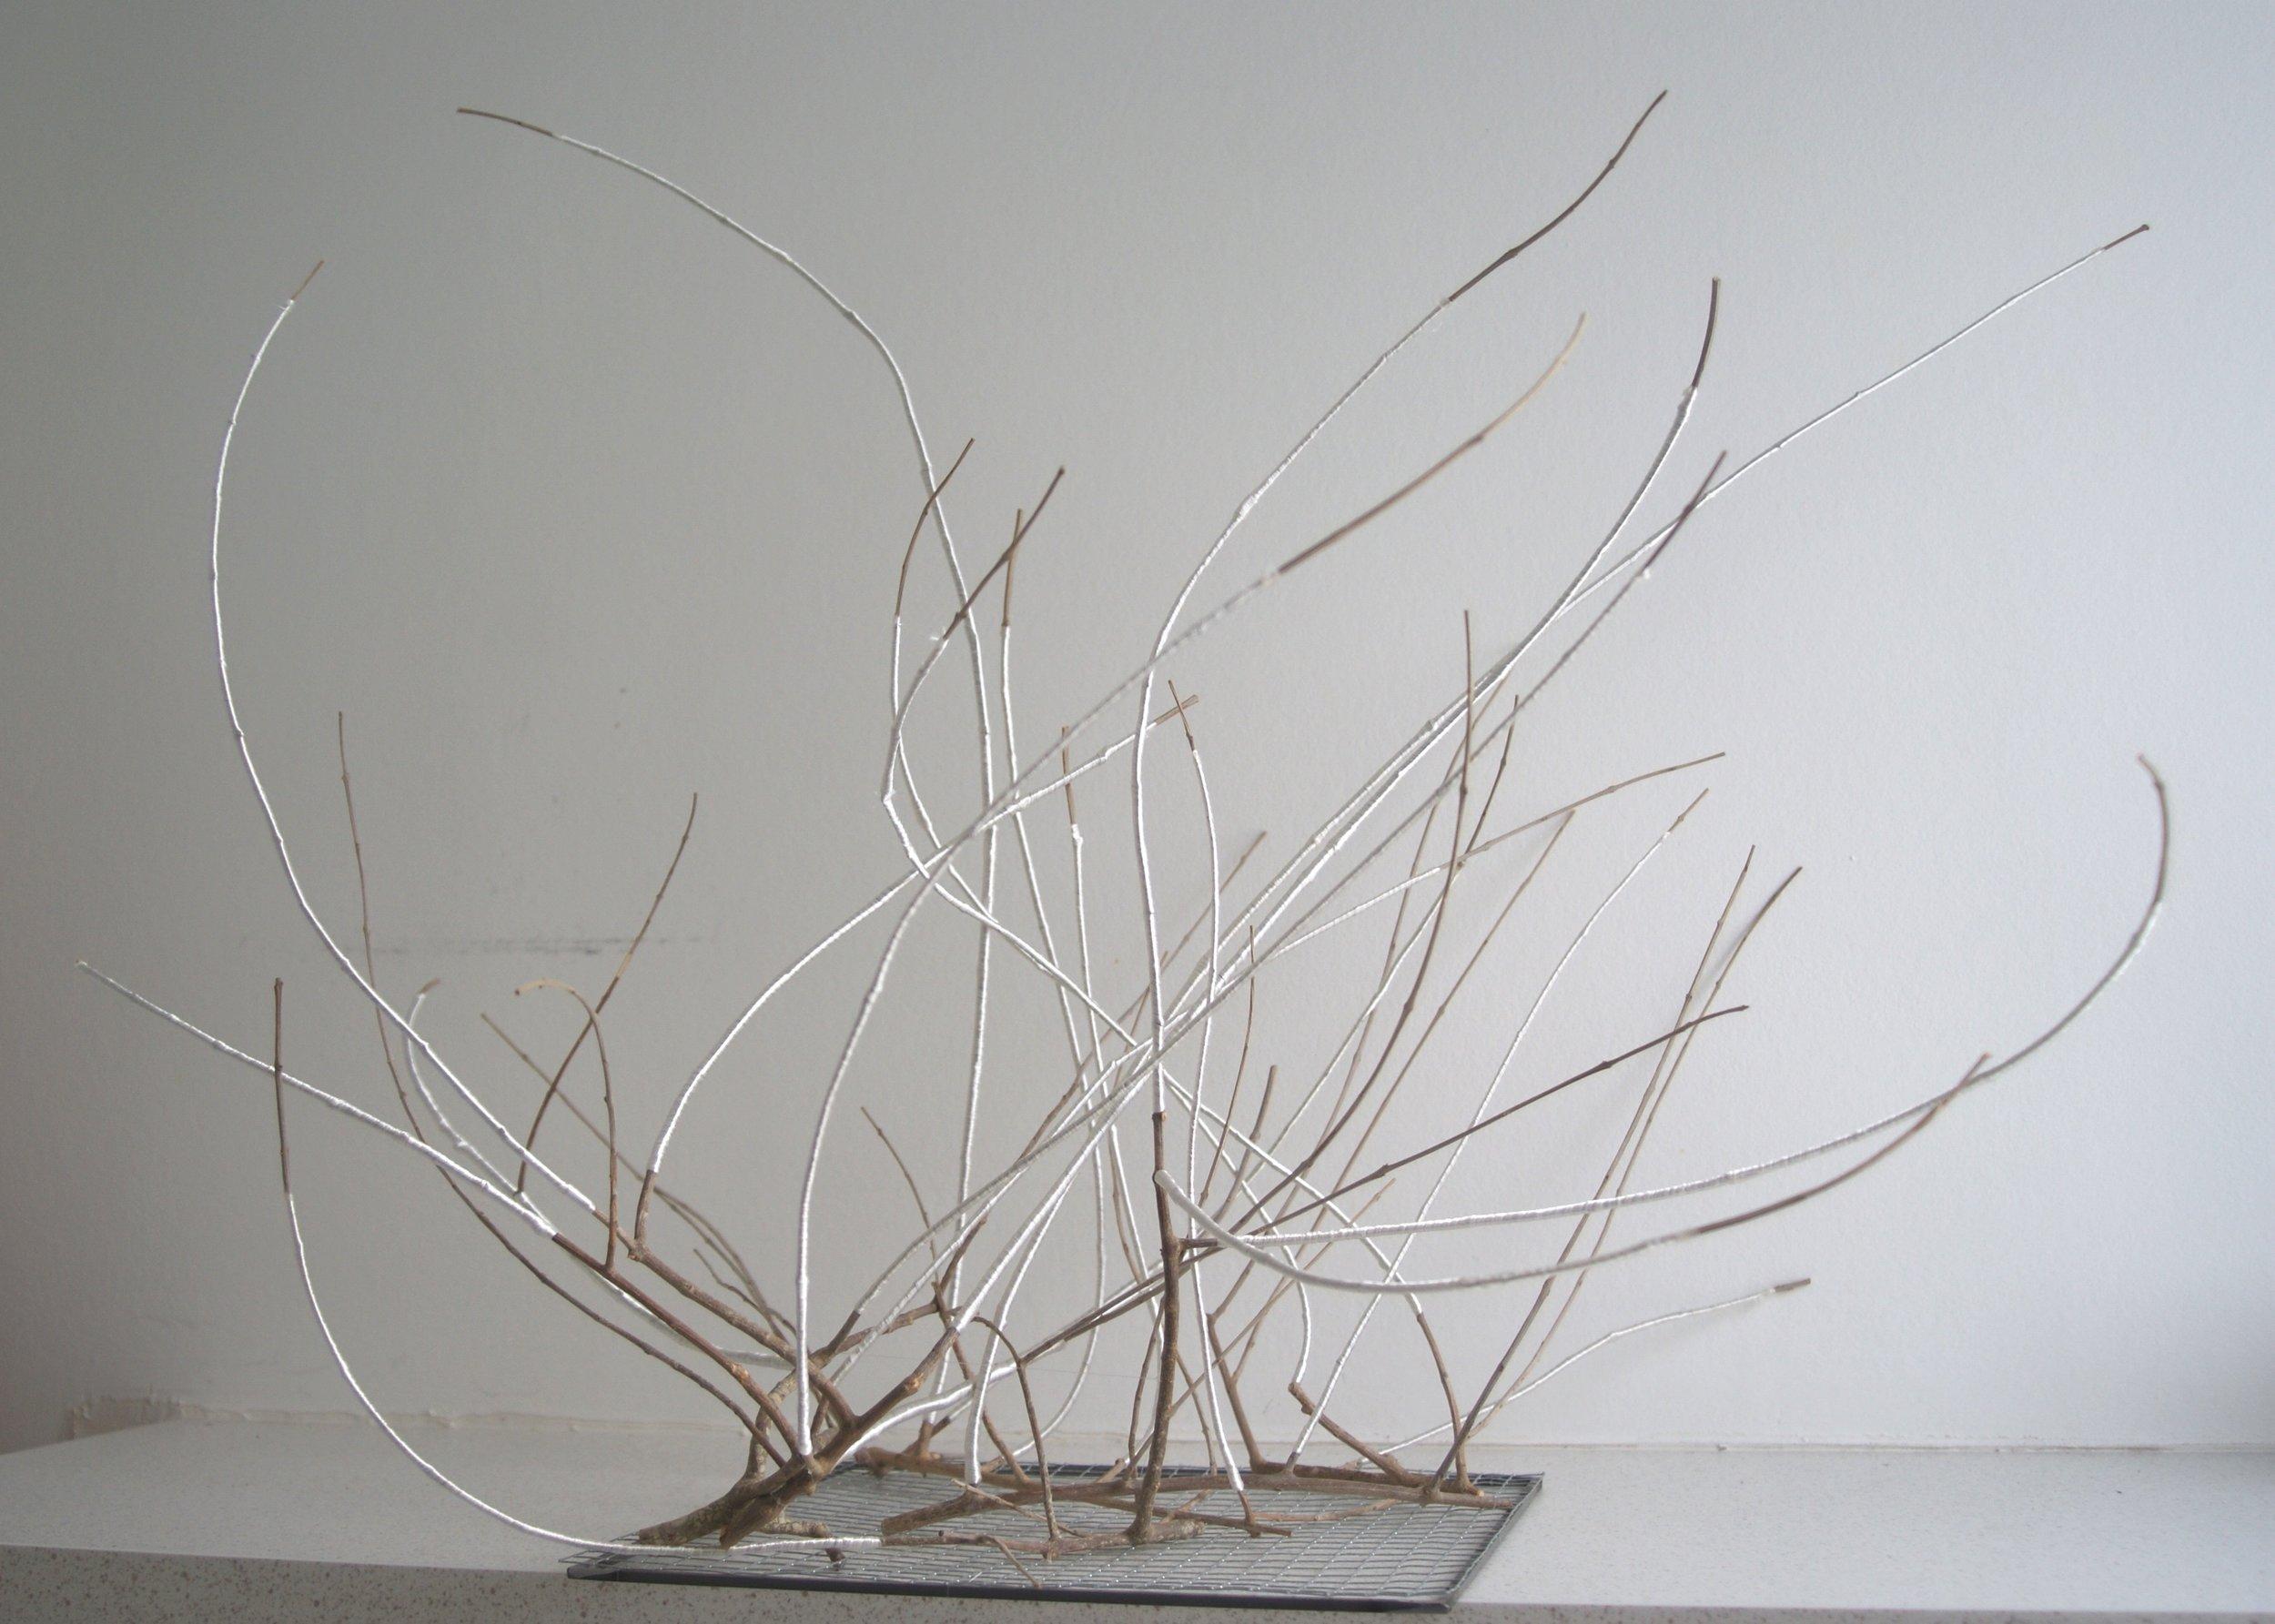 Olivier, fil de soie, grillage, 60-75-60cm